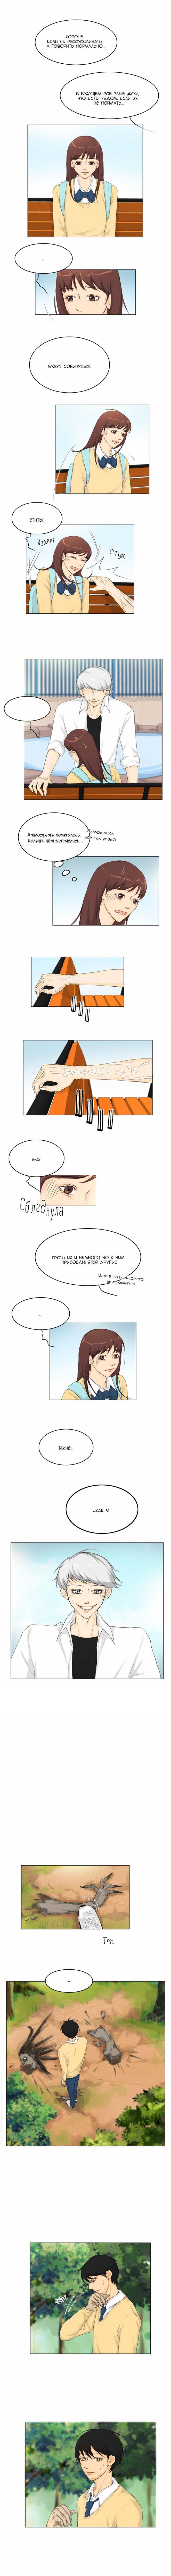 https://r1.ninemanga.com/comics/pic2/8/31048/426330/1535044166910.jpg Page 5